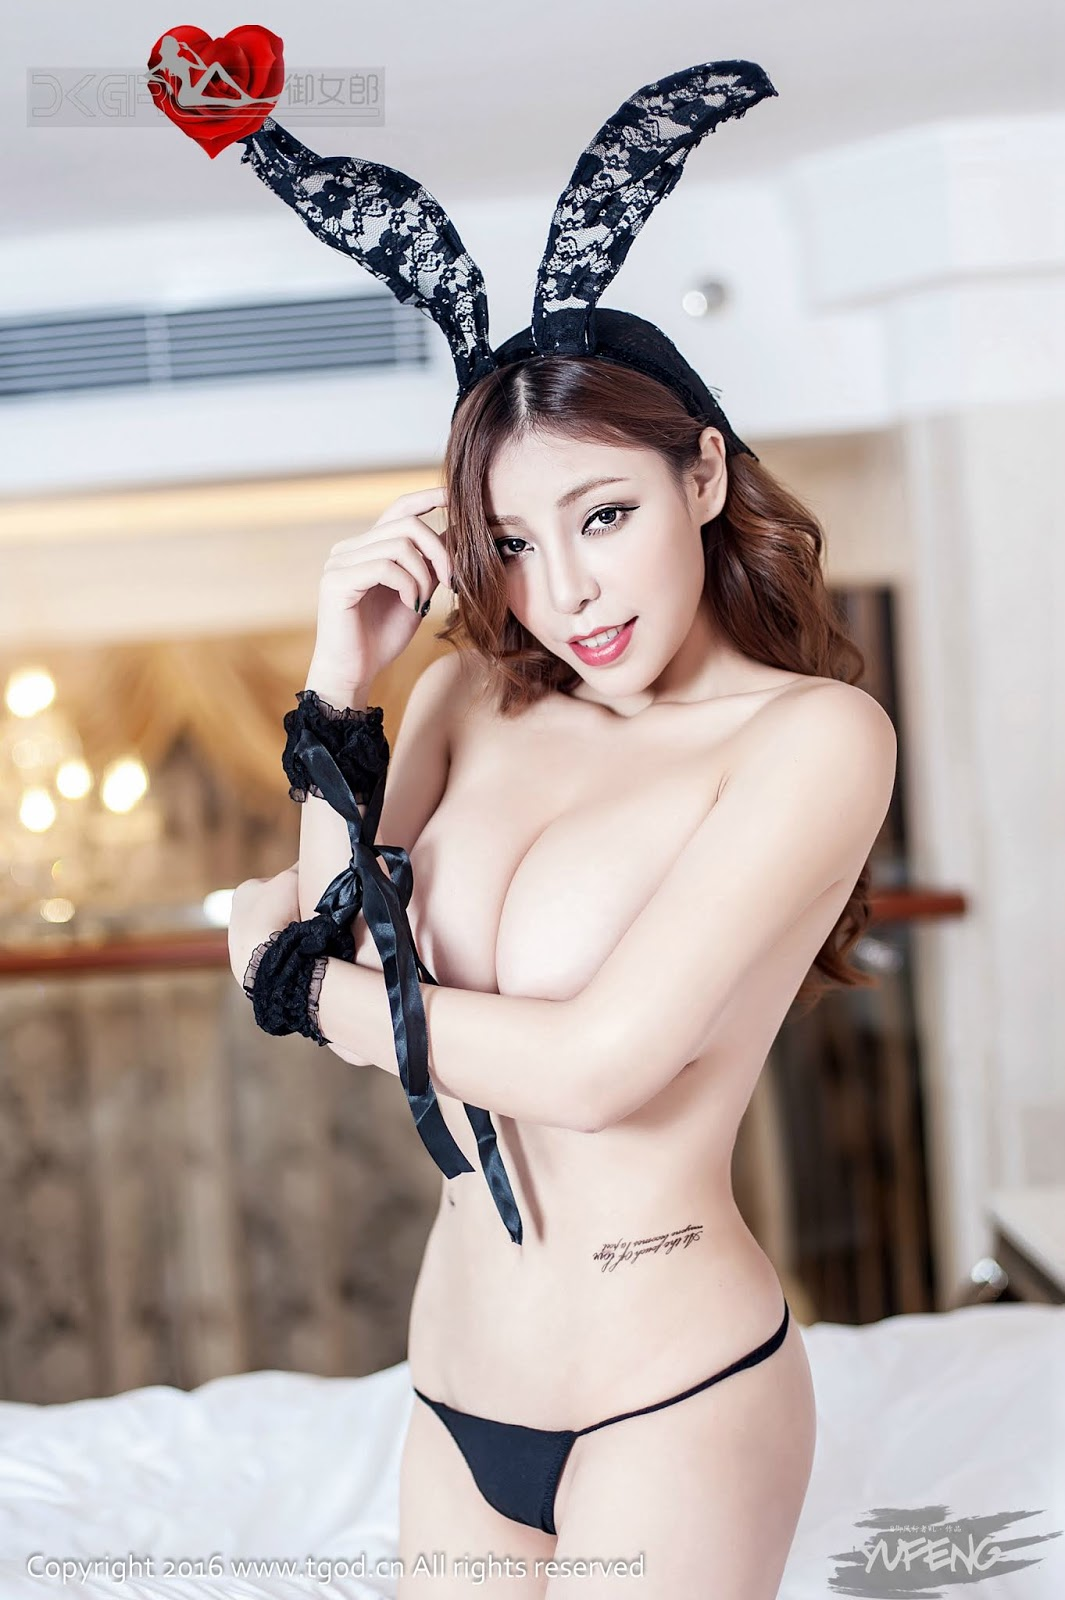 Chinese Girl Elise谭晓彤 - TGOD推女神 (58 Pict)